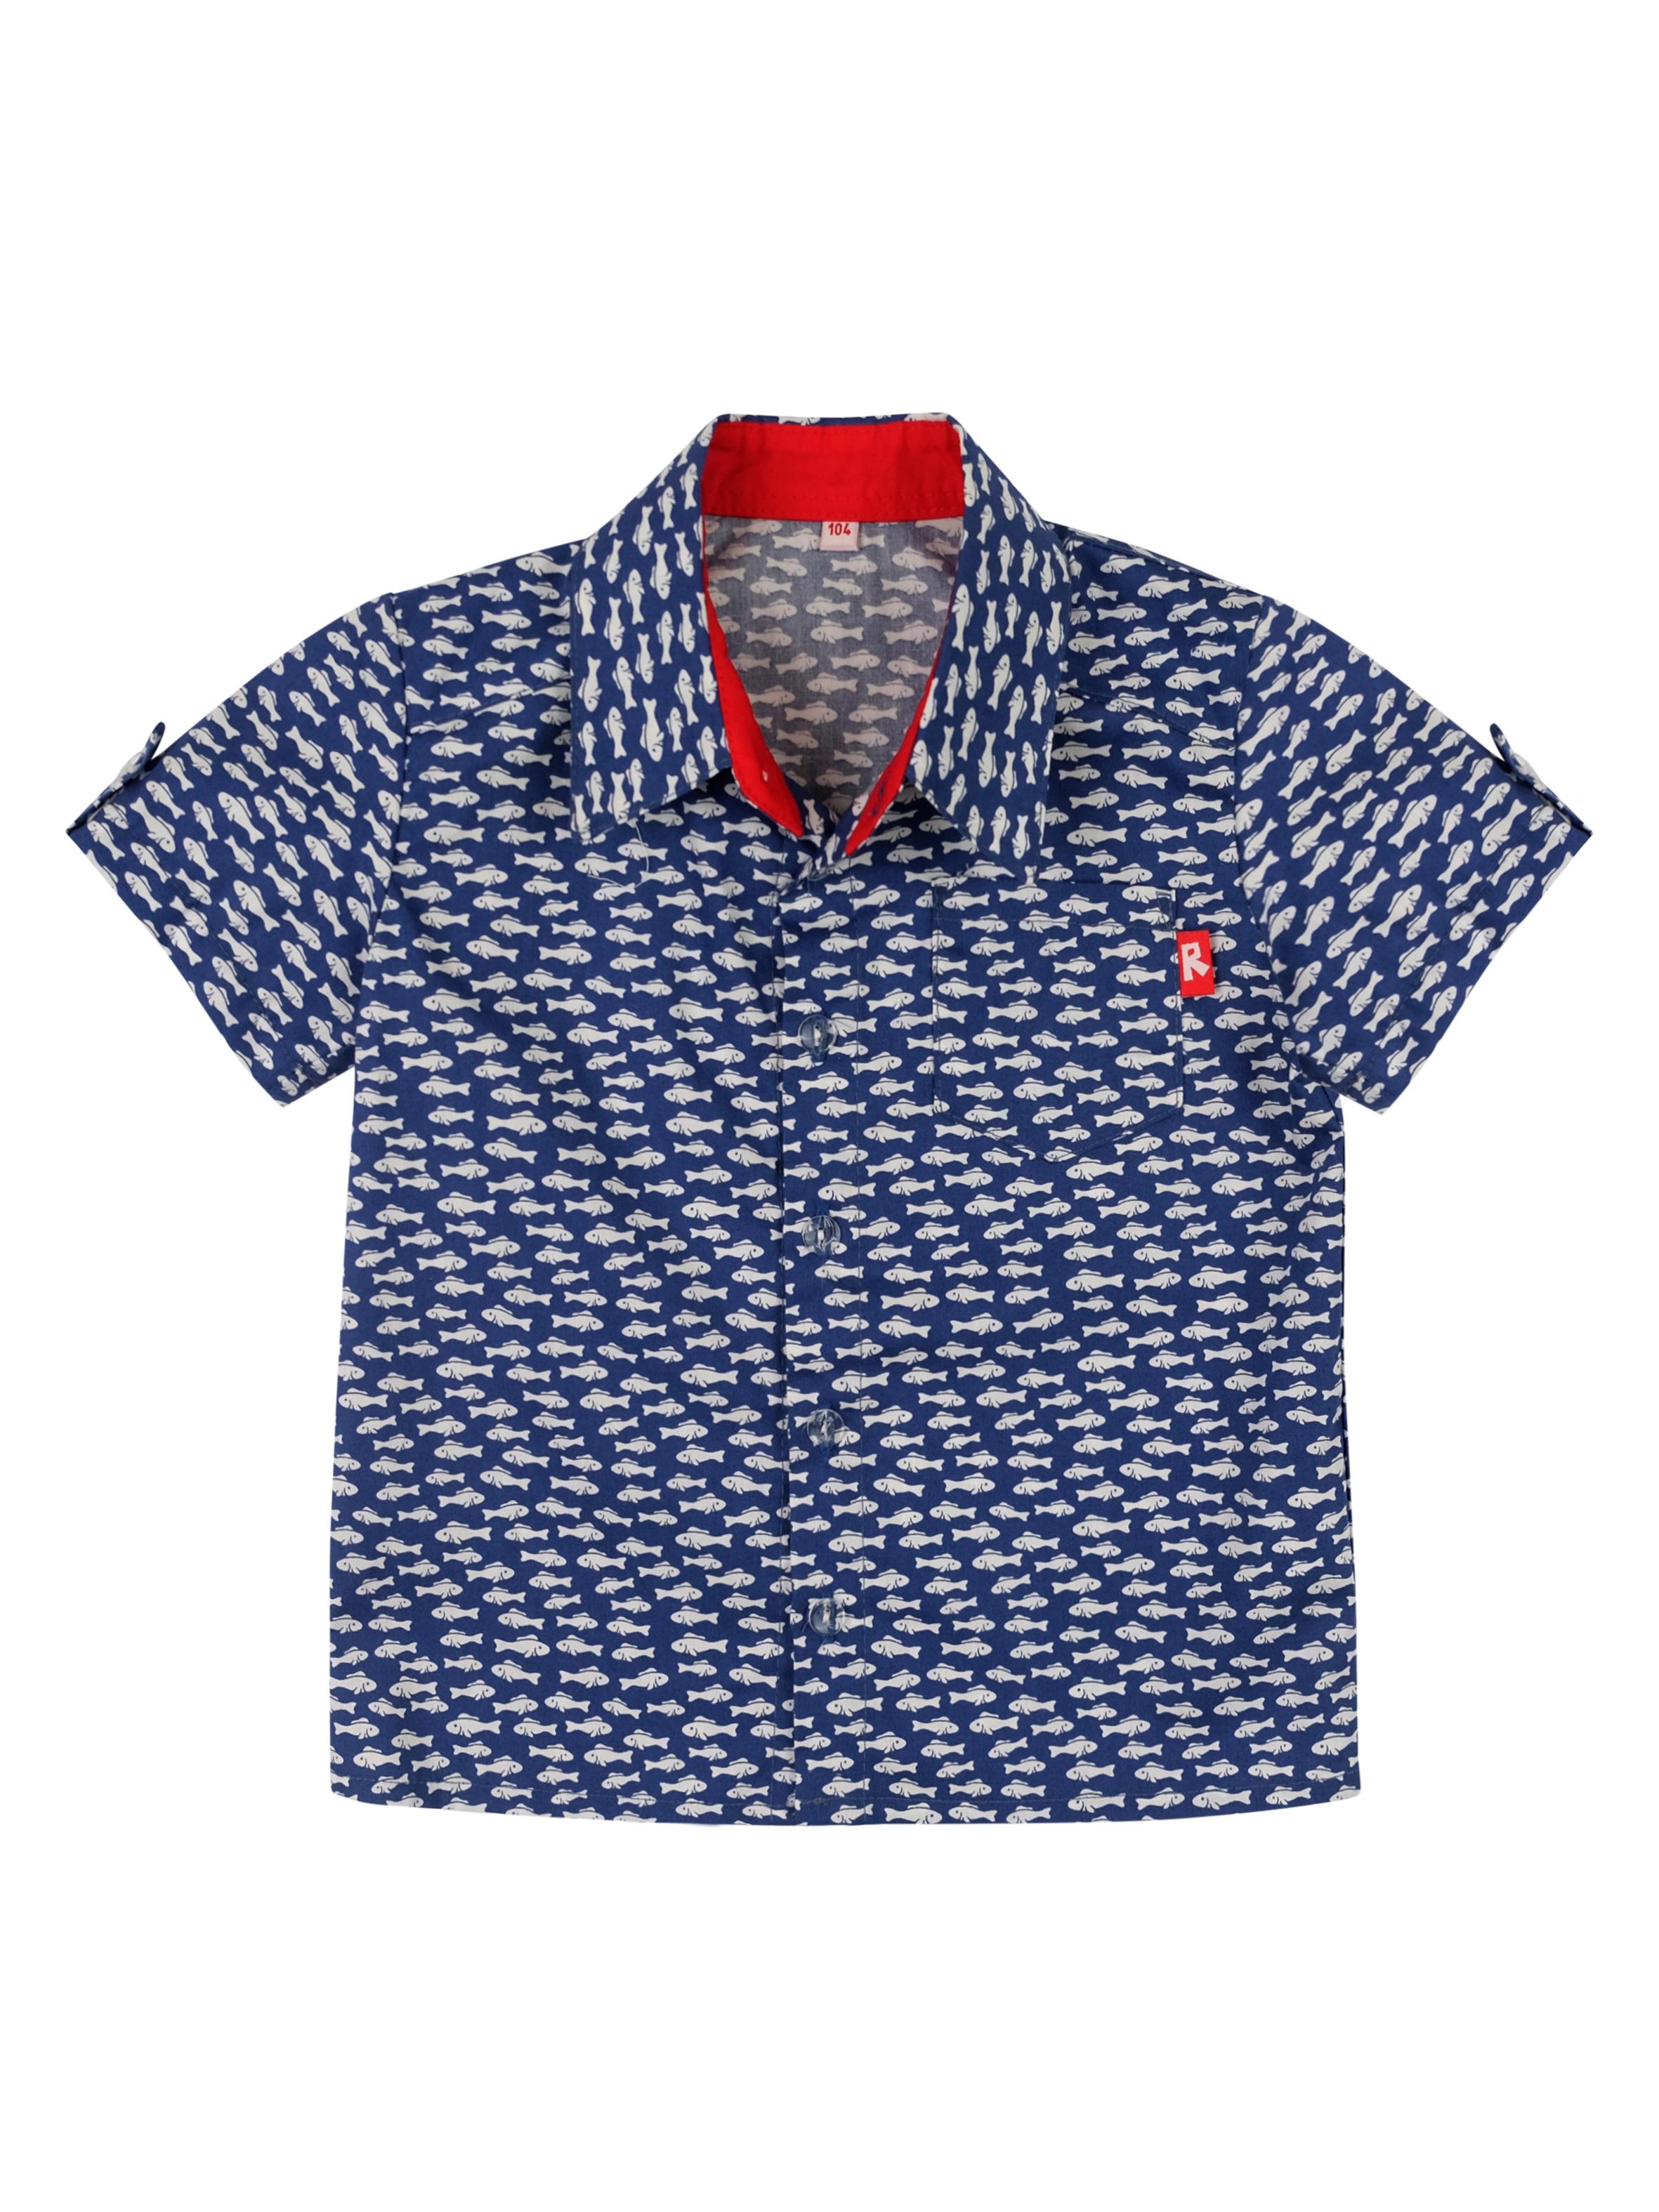 Рубашка для мальчика Reike синяя, RKS012SS20MRN navy, 86-52 18 мес.